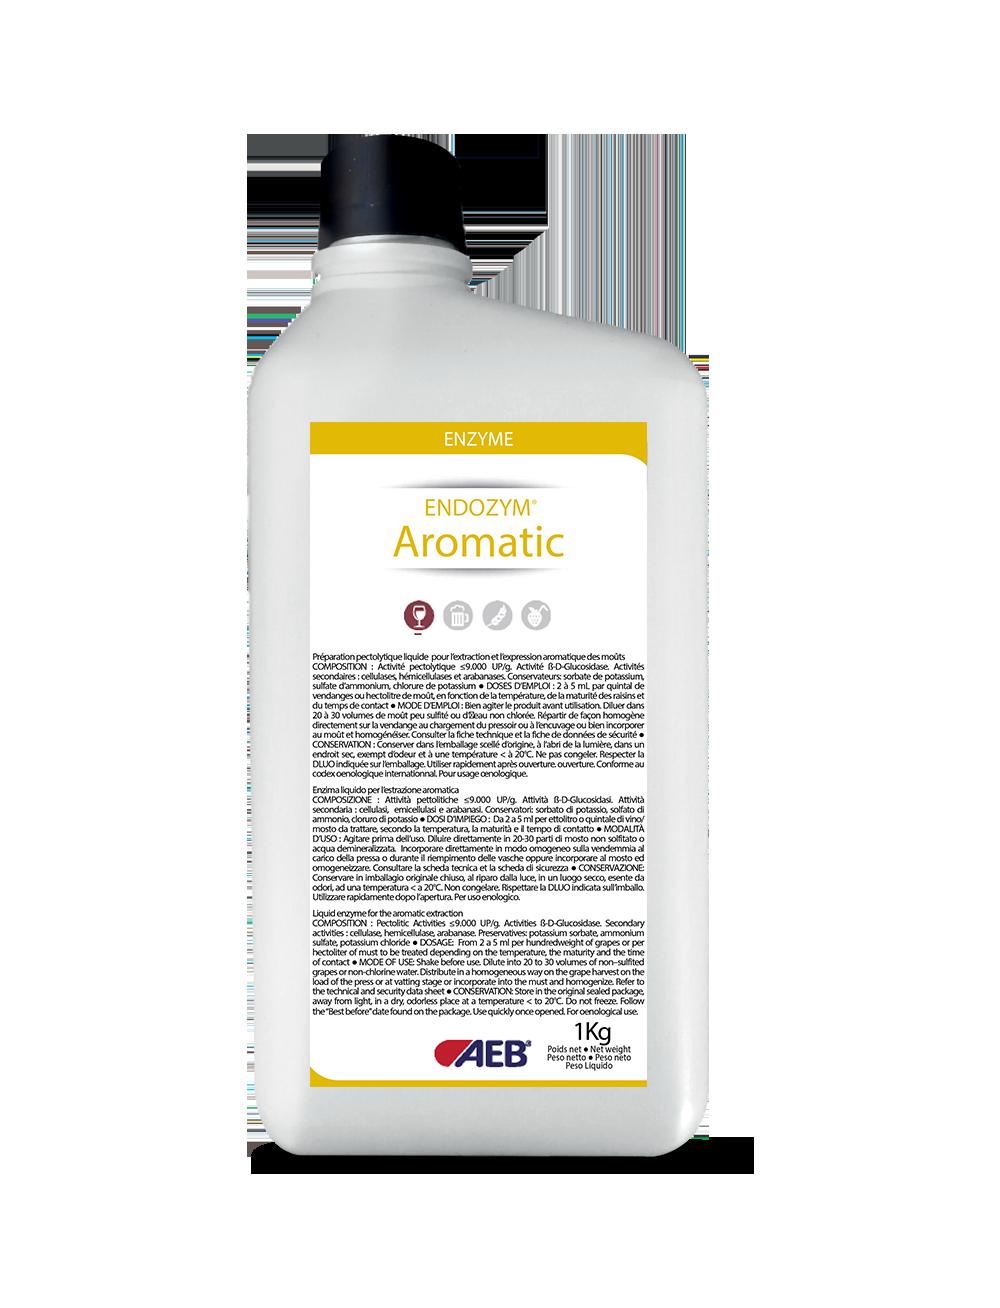 ENDOZYM Aromatic